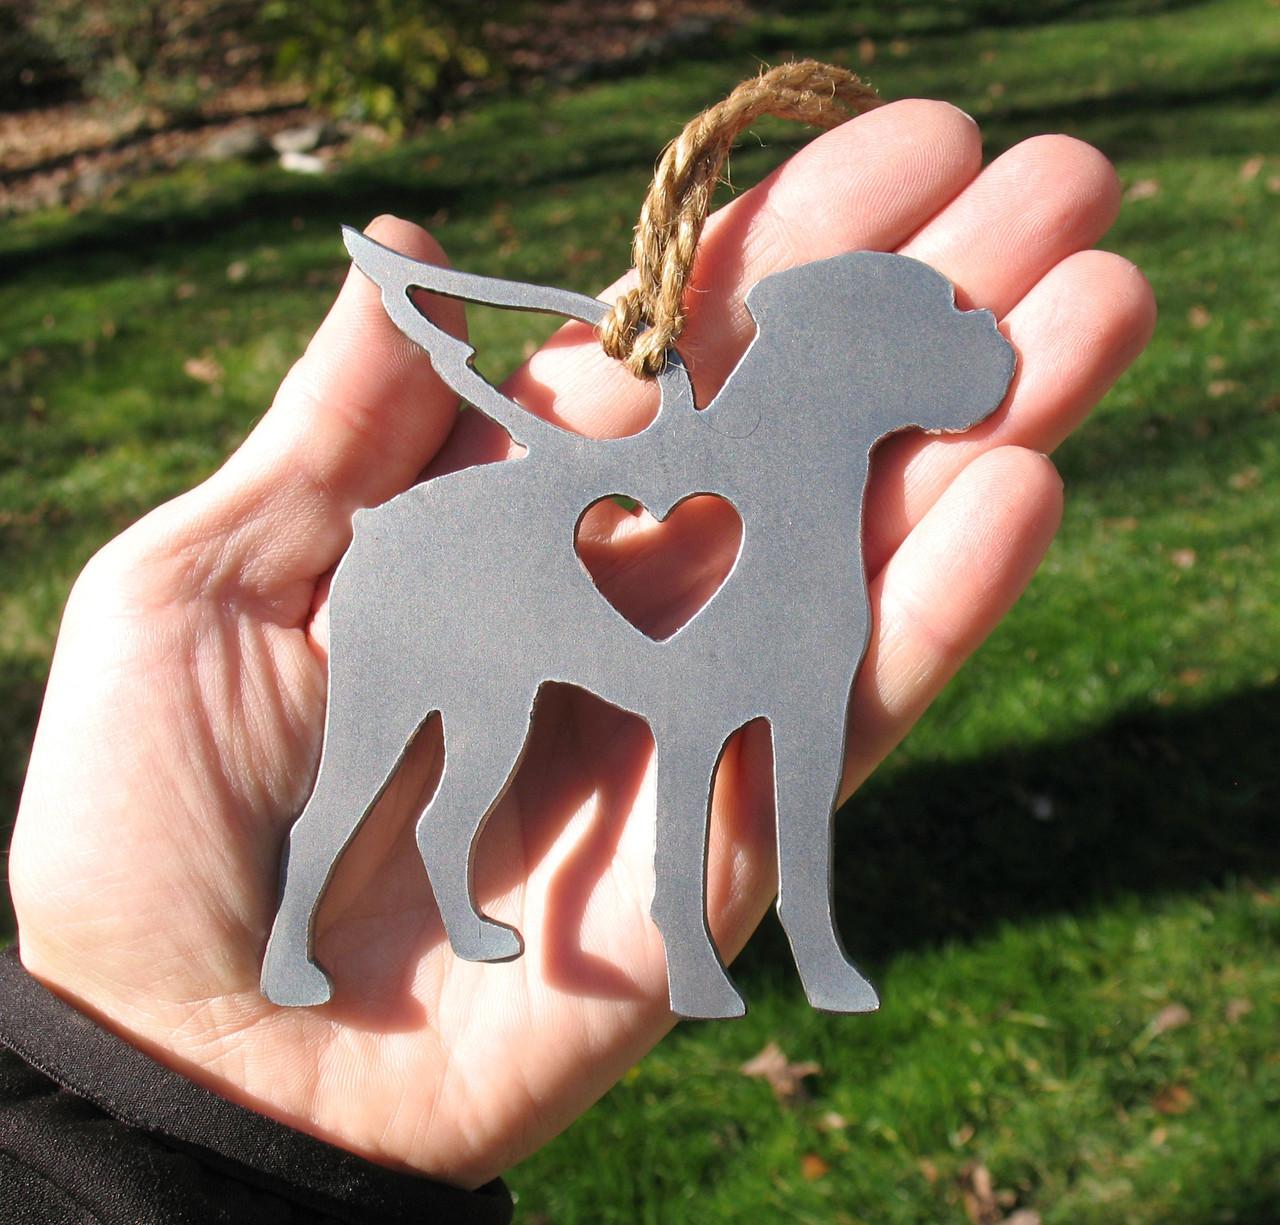 Boxer Dog 5 Pet Loss Gift Ornament Angel - Pet Memorial - Dog Sympathy Remembrance Gift - Metal Dog Christmas Ornament